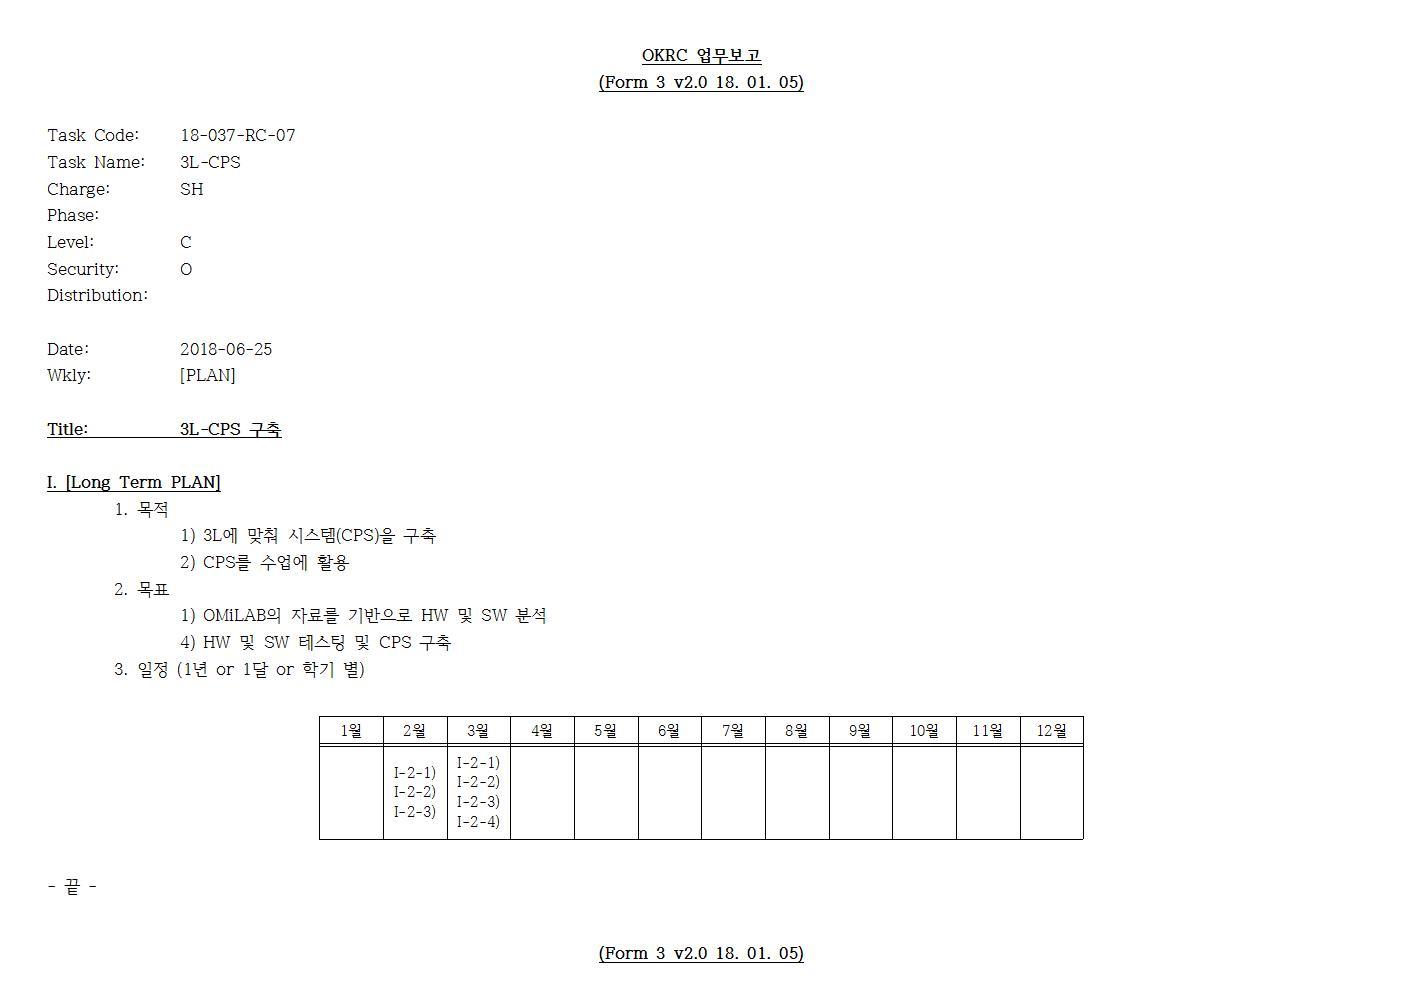 D-[18-037-RC-07]-[3L-CPS]-[2018-06-25][SH]001.jpg